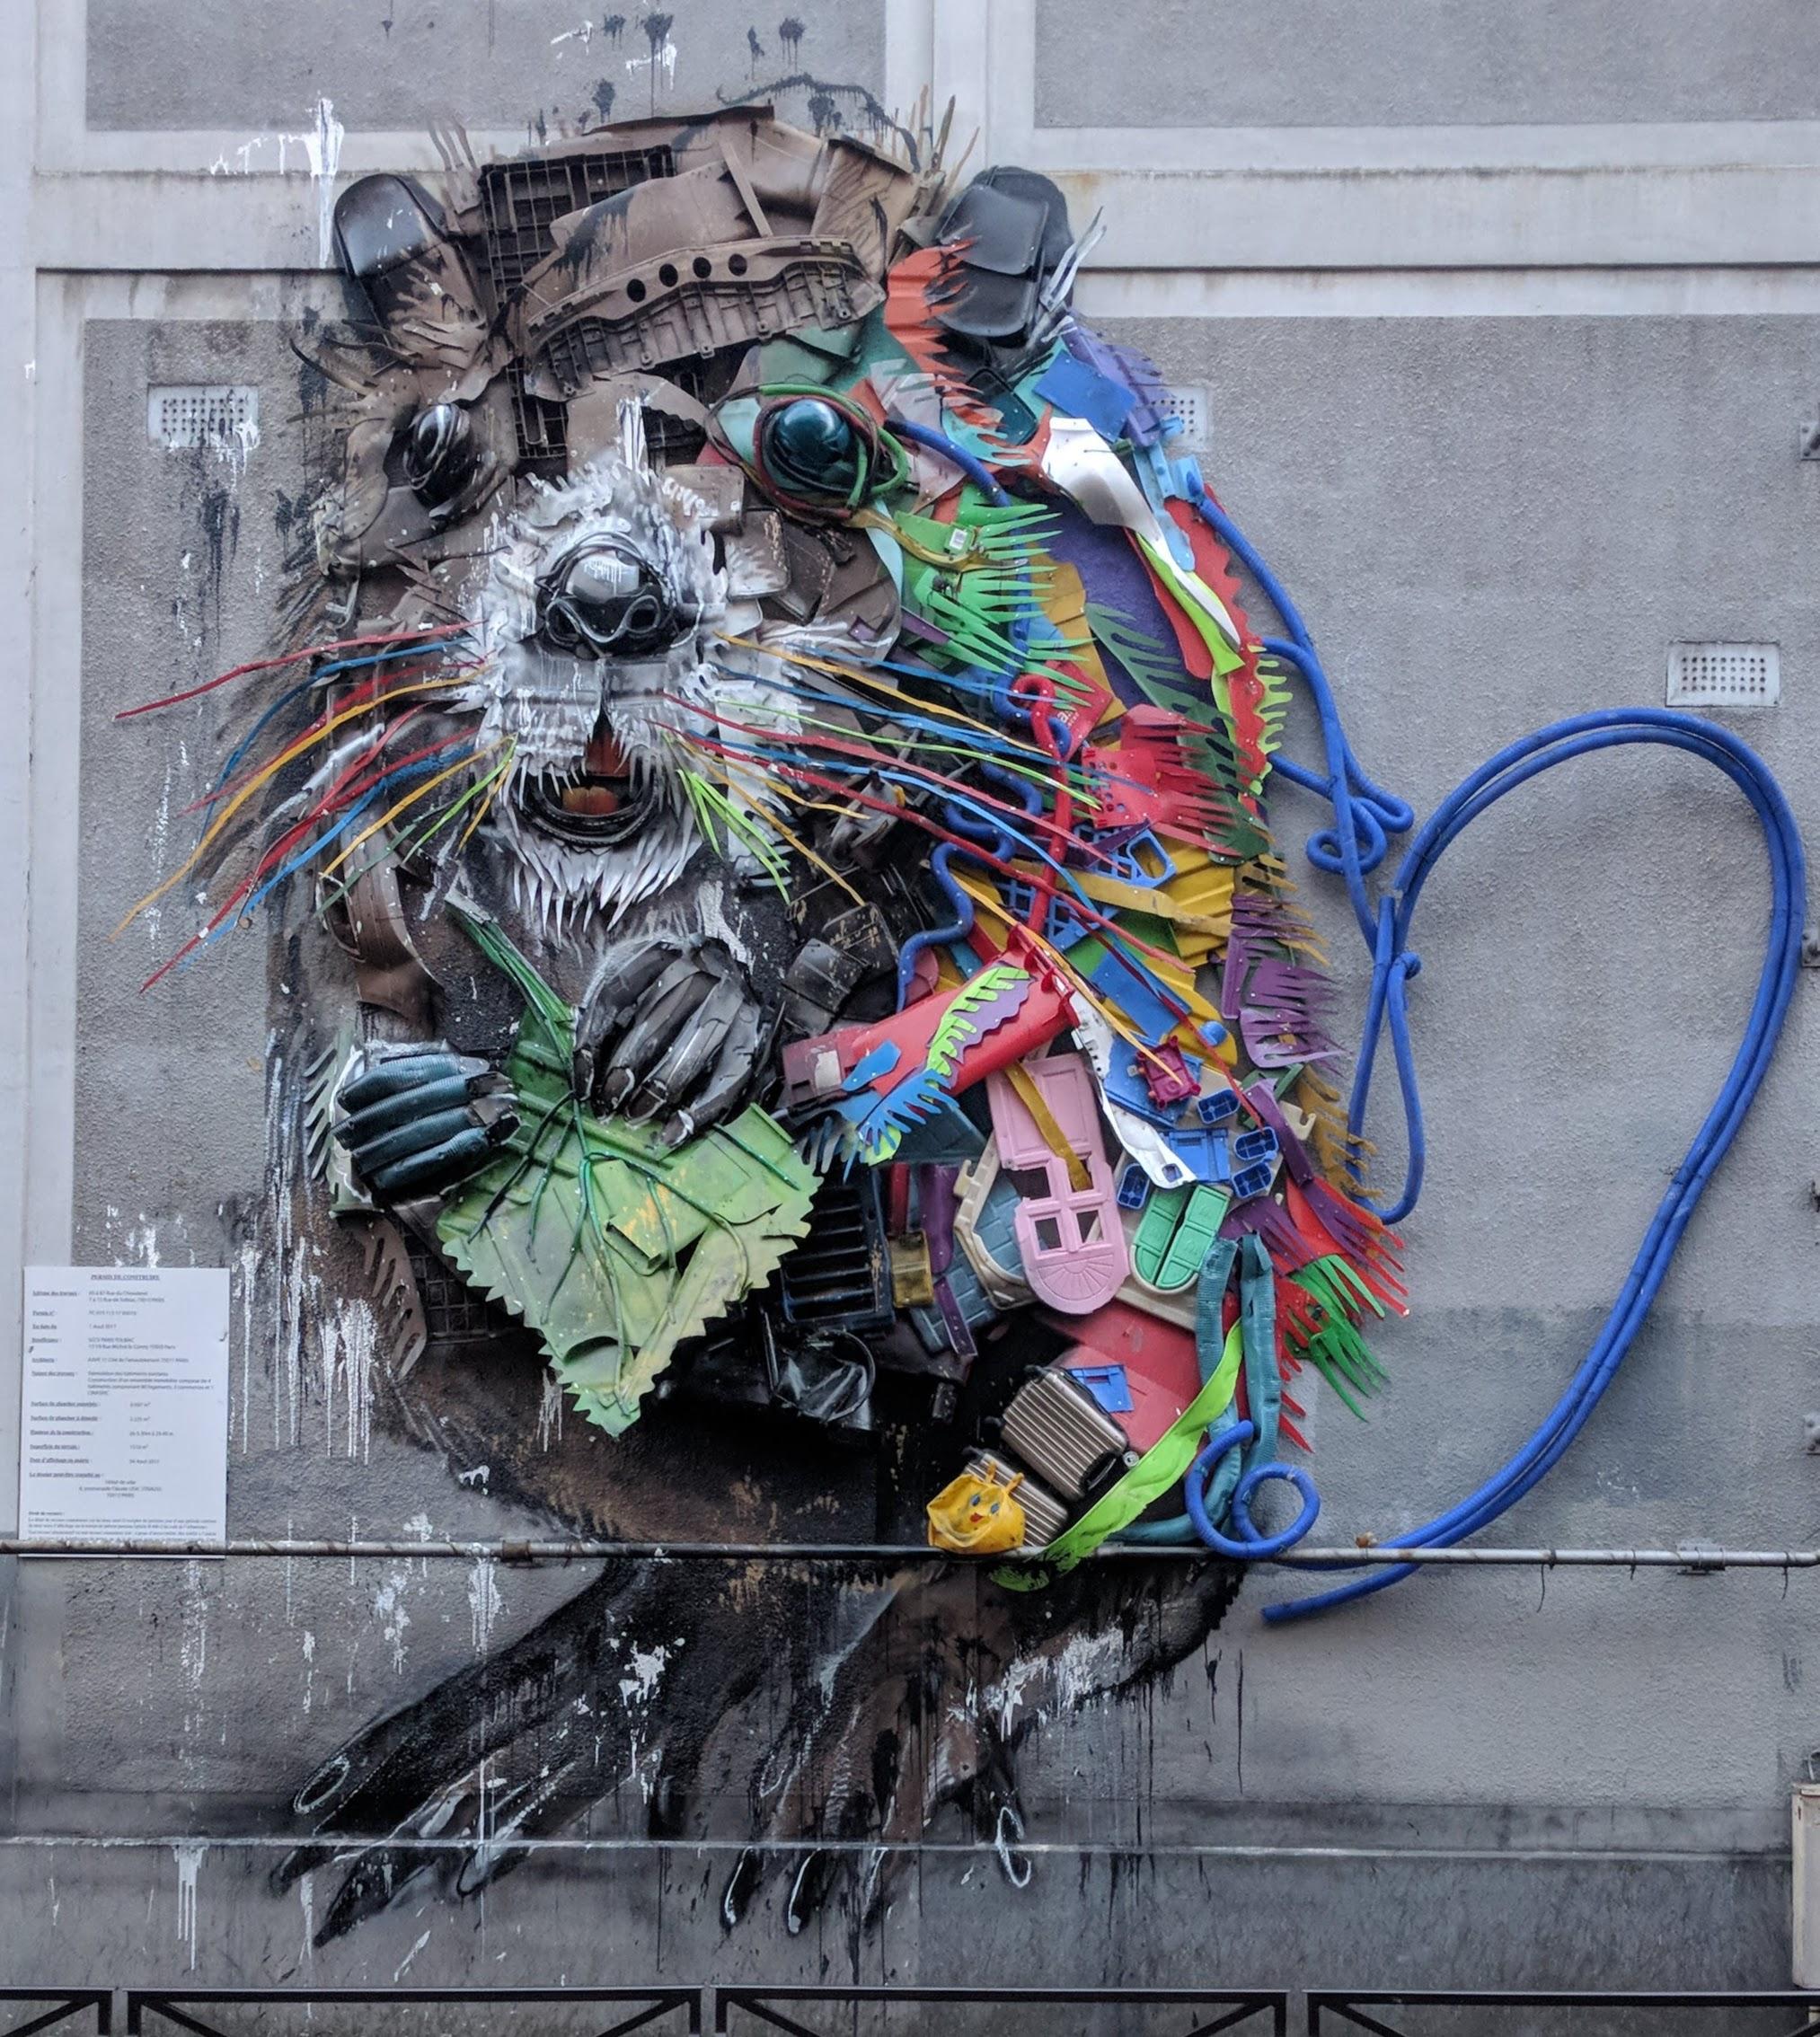 STS et street art